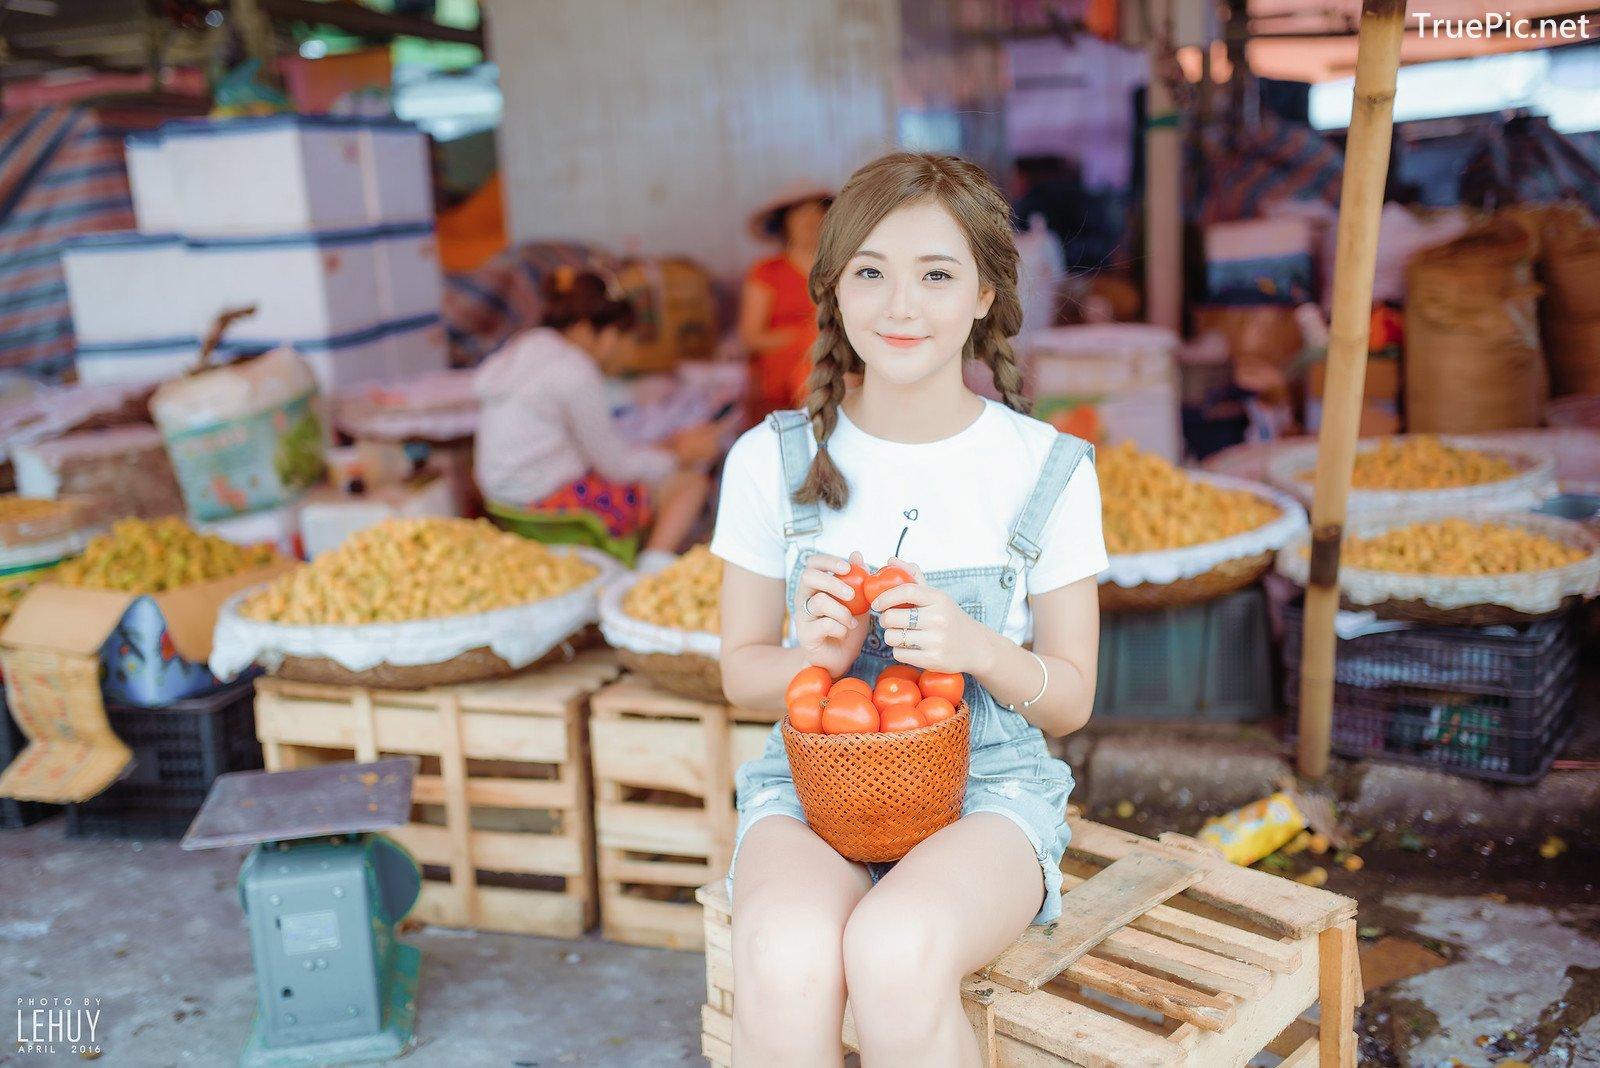 Image-Vietnamese-Hot-Girl-Photo-Album-Tomato-Little-Girl-Cute-TruePic.net- Picture-9